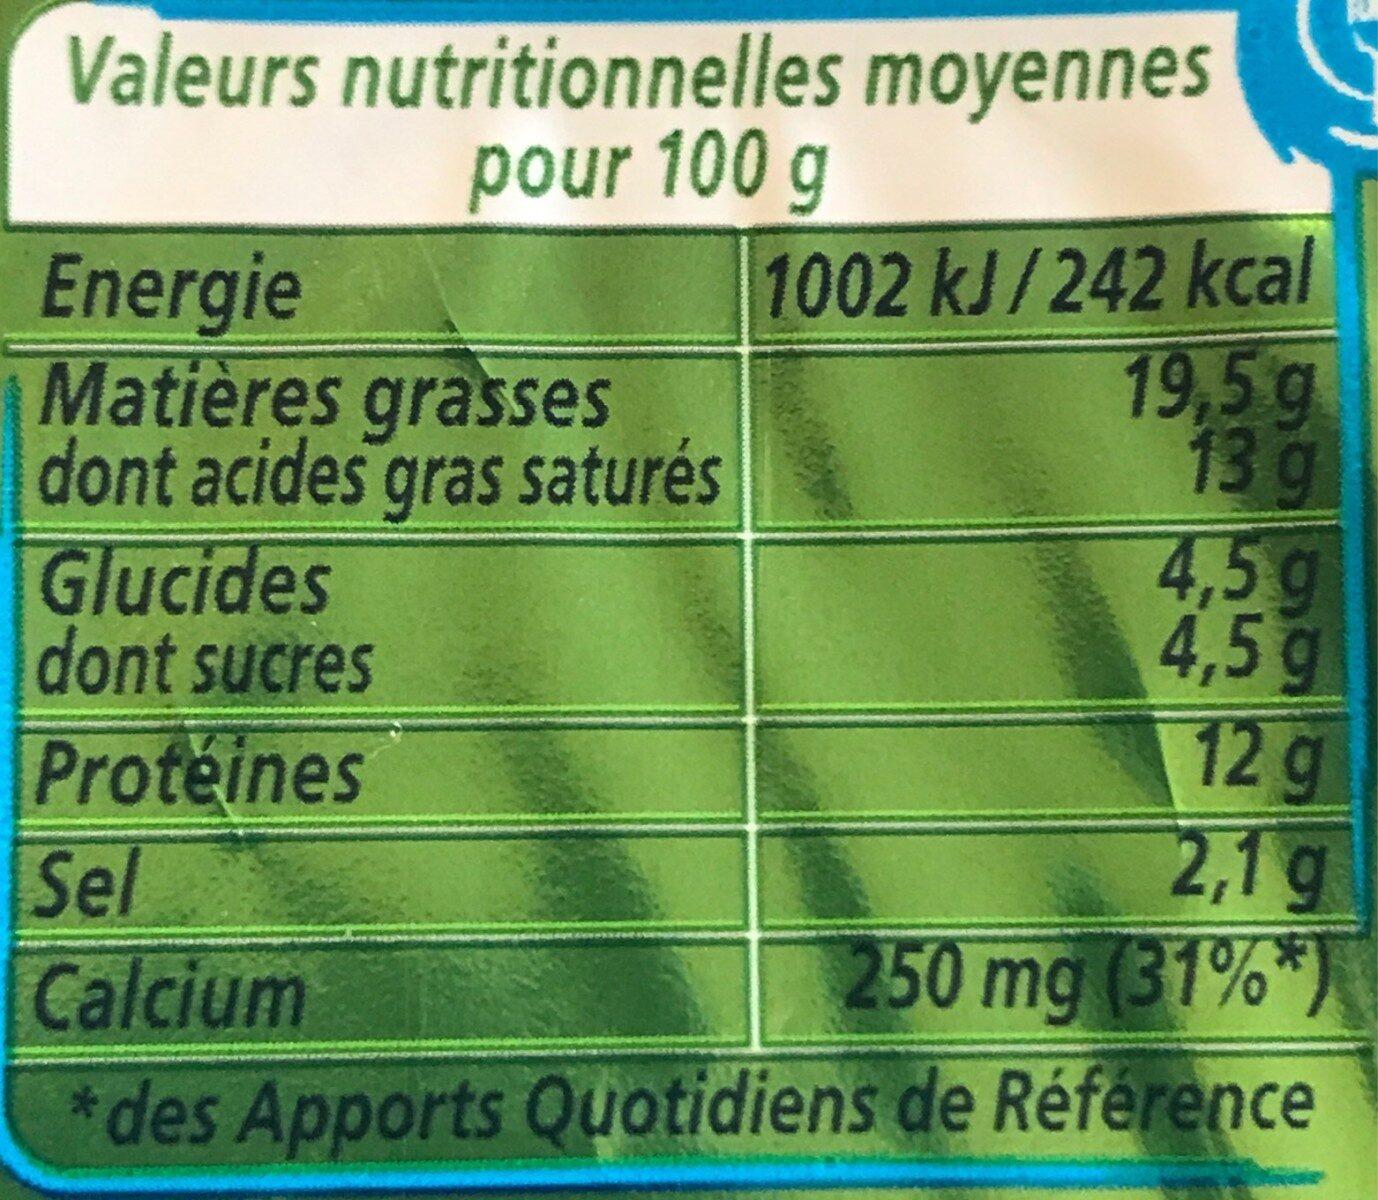 Recettes savoyardes - Nutrition facts